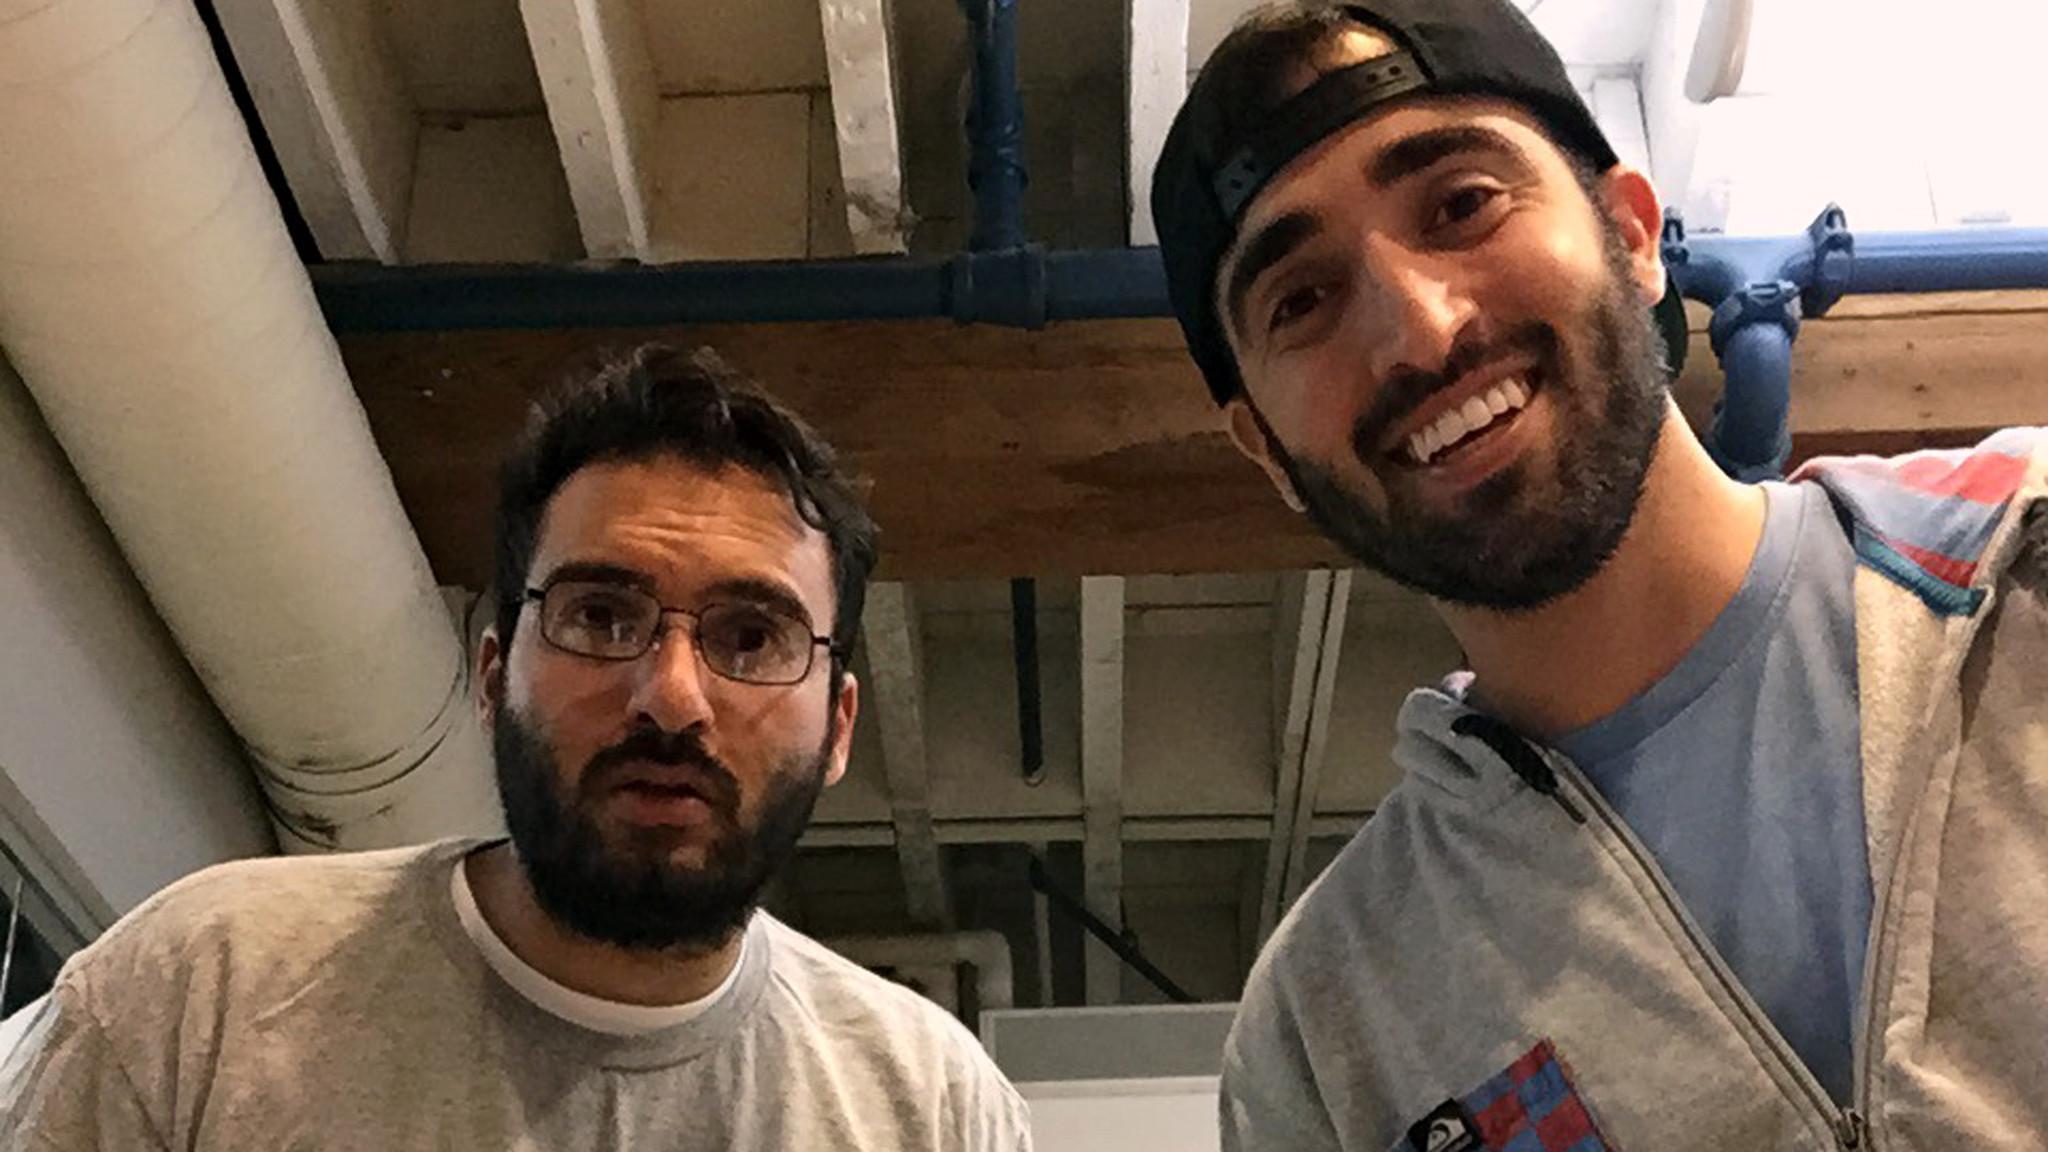 Selfie app Shots raises $8.5 million in funding, adds video feature